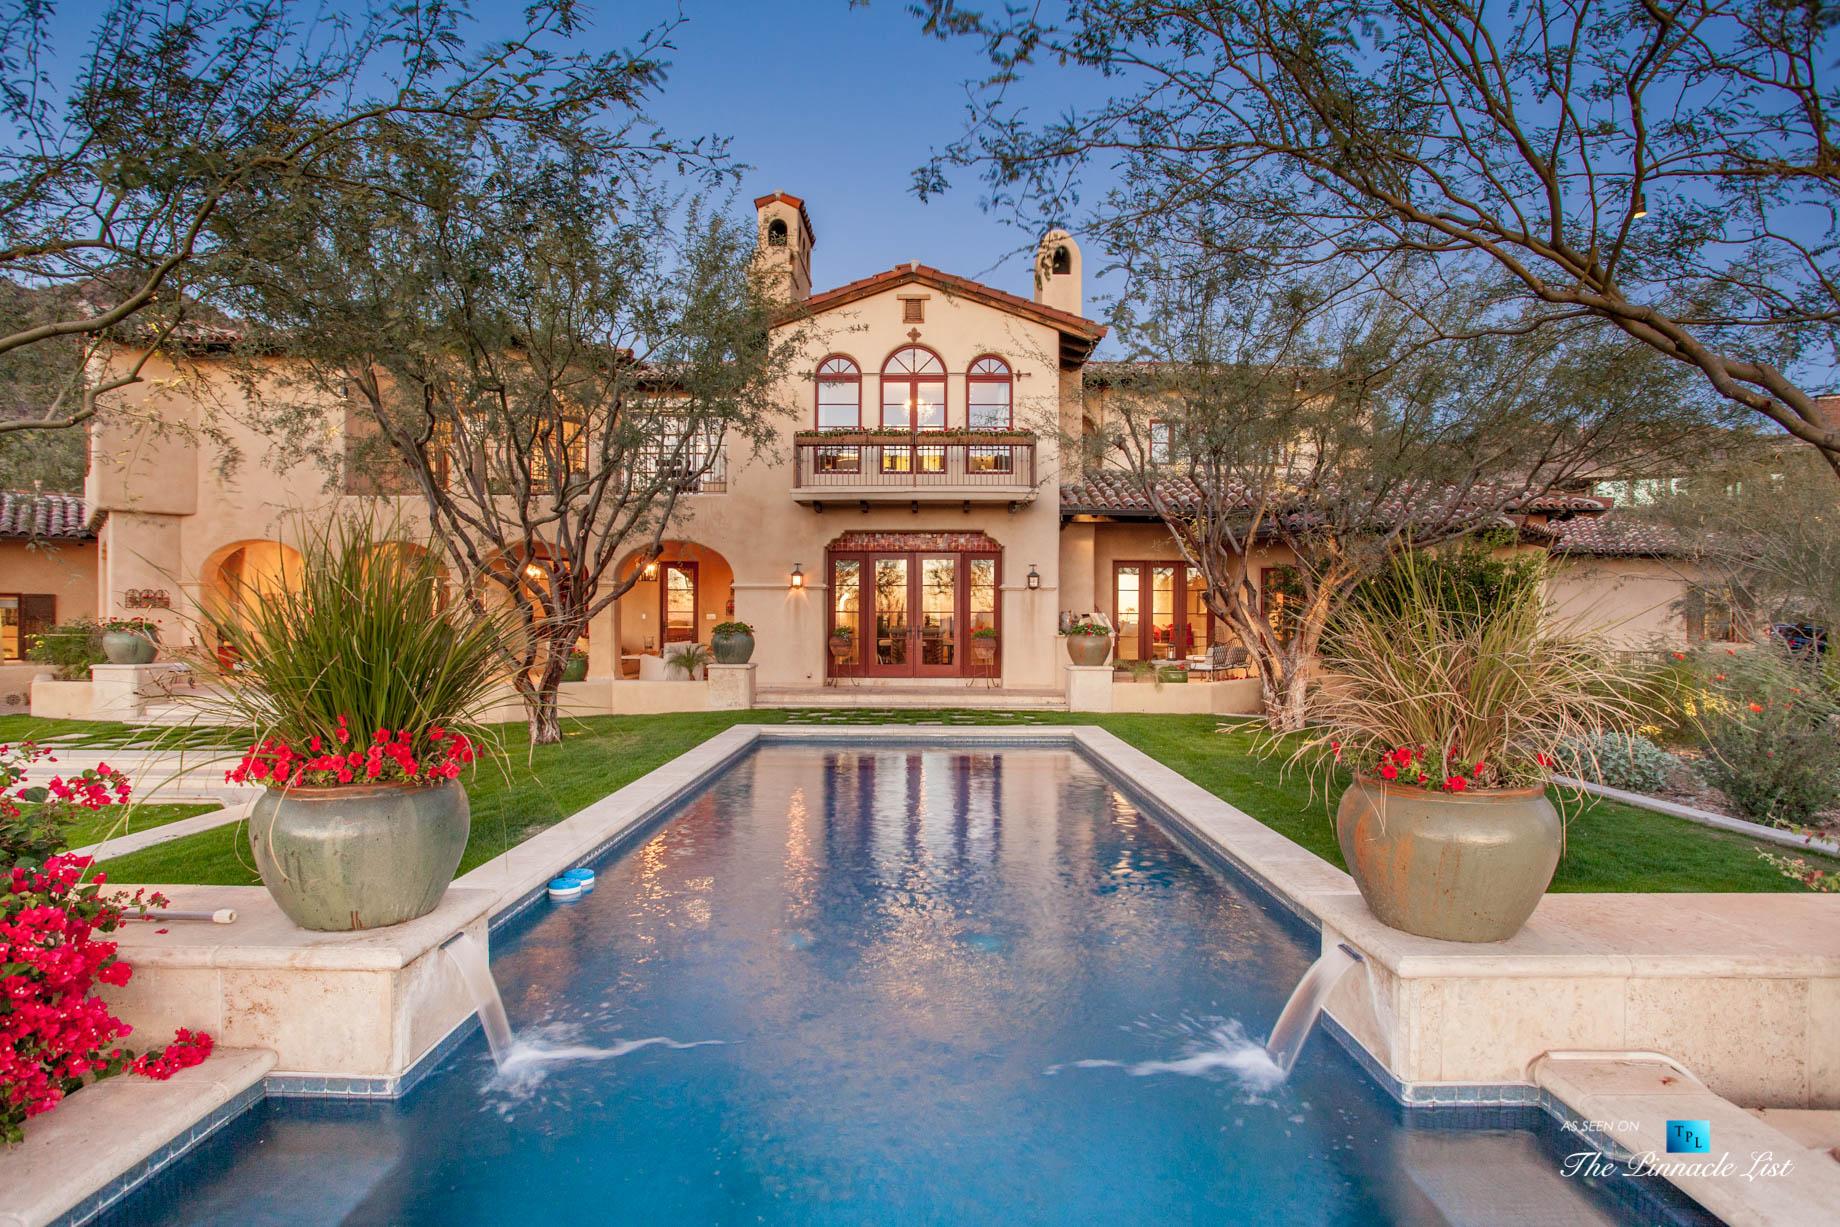 Spanish Colonial Biltmore Mountain Estate – 6539 N 31st Pl, Phoenix, AZ, USA – Backyard Exterior Pool